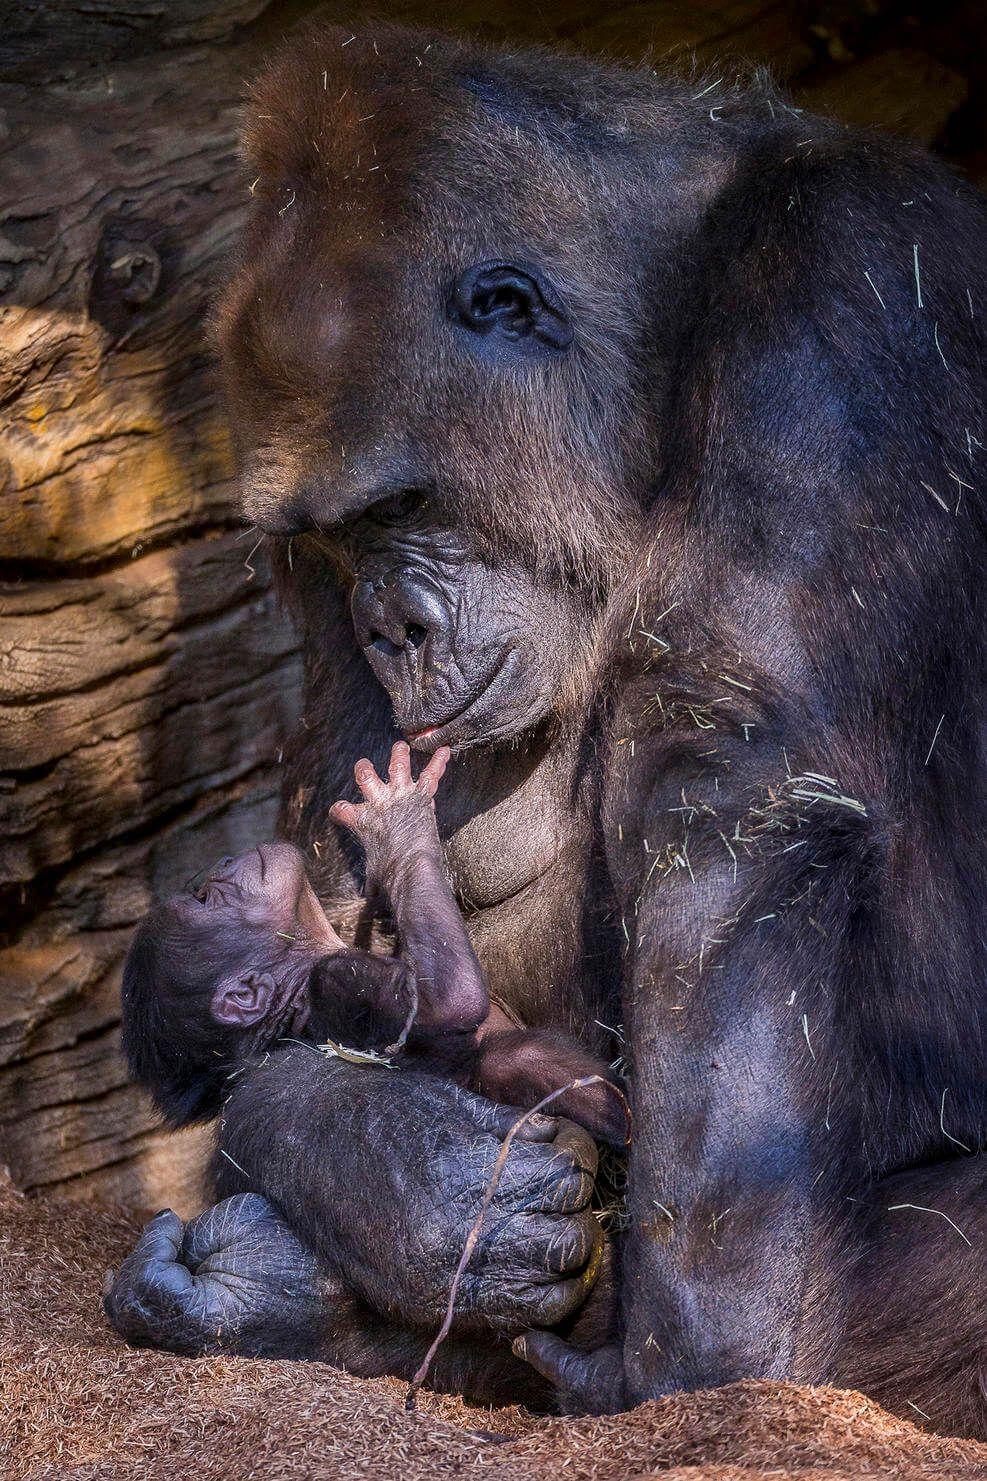 gorilla-born-8